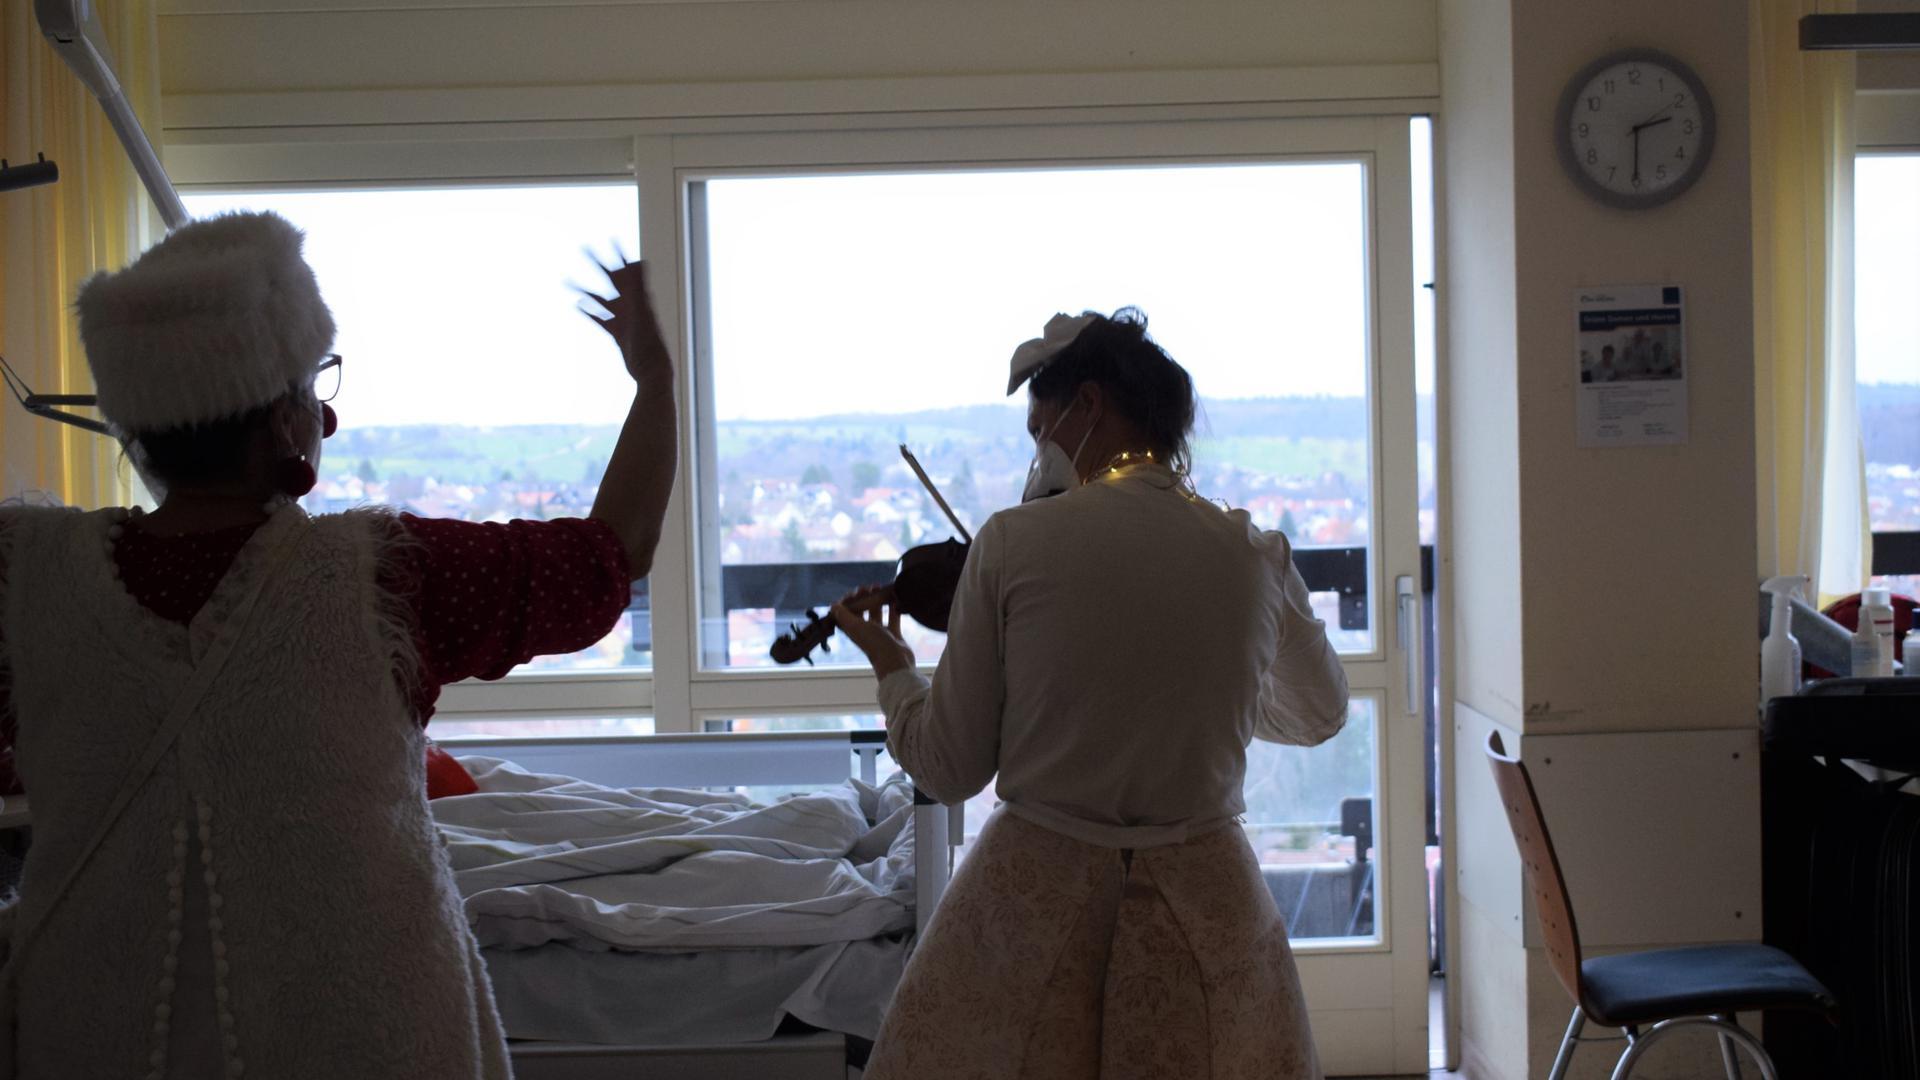 Der Clown spielt Geige: Berenike Felger (rechts) stimmt am Patientenbett ein Weihnachtslied an, Kollegin Doris Batzler dirigiert.